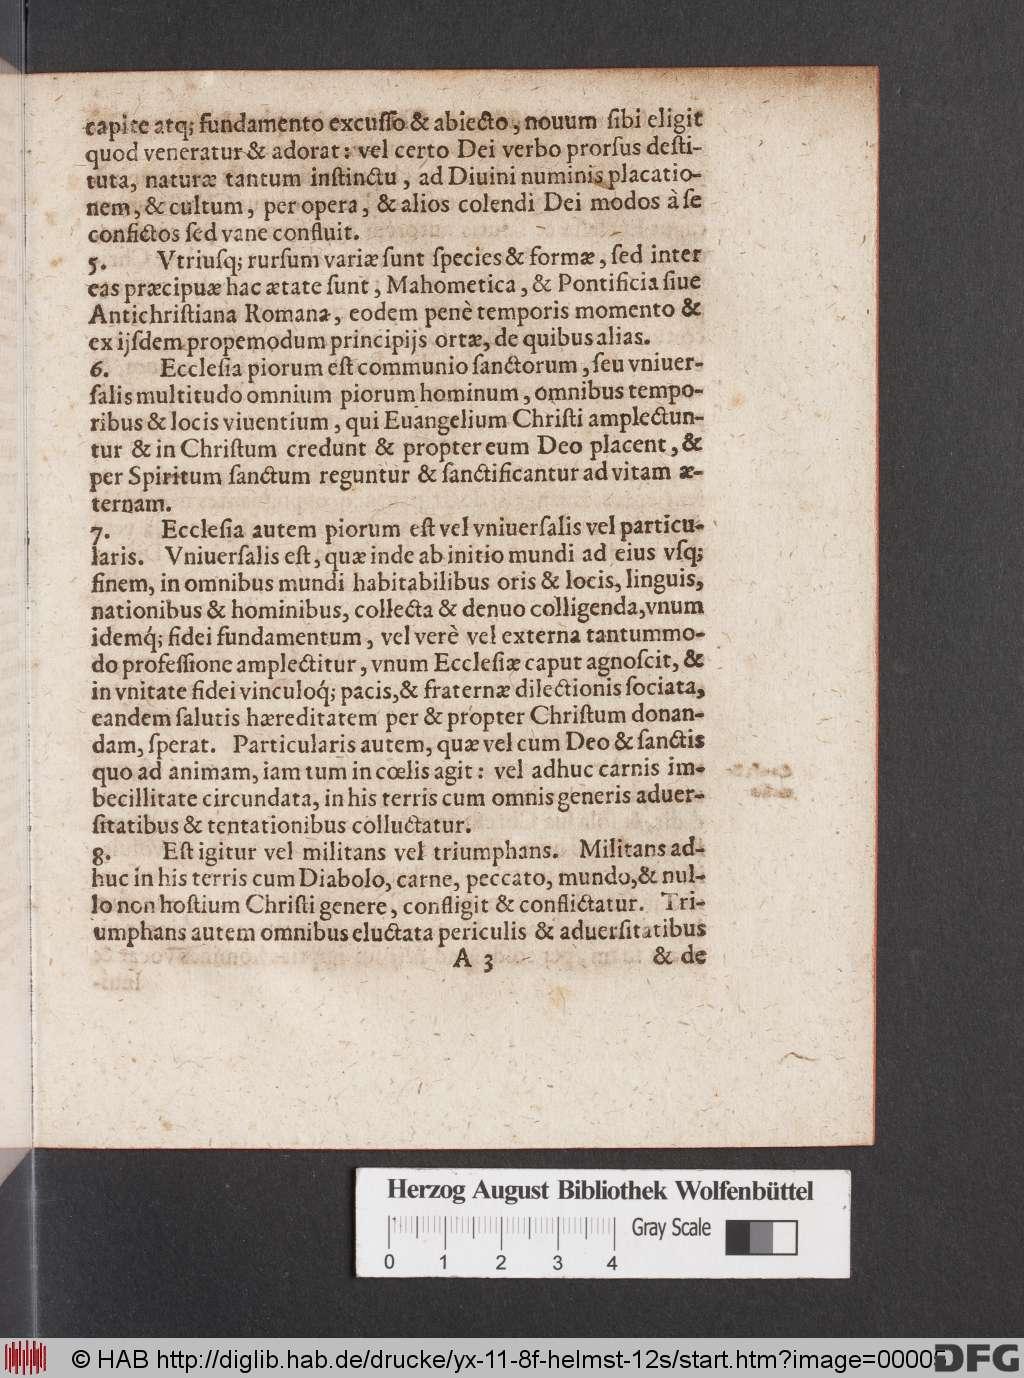 http://diglib.hab.de/drucke/yx-11-8f-helmst-12s/00005.jpg